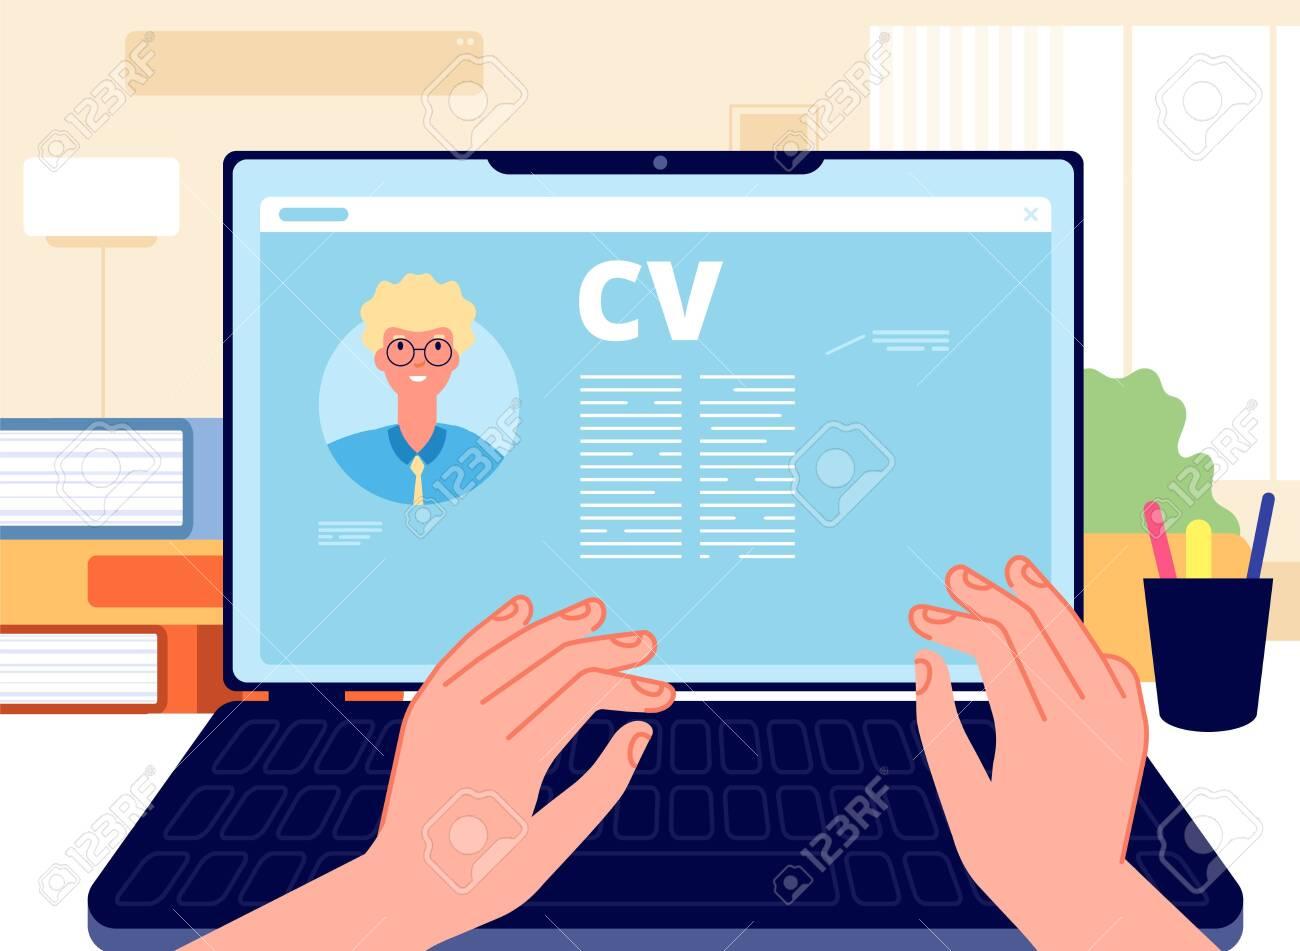 Online CV. Young man writing job application on laptop. HR concept, searching job in internet. Career start, hands working on computer vector illustration. Internet online, hr employee, write cv - 155203867